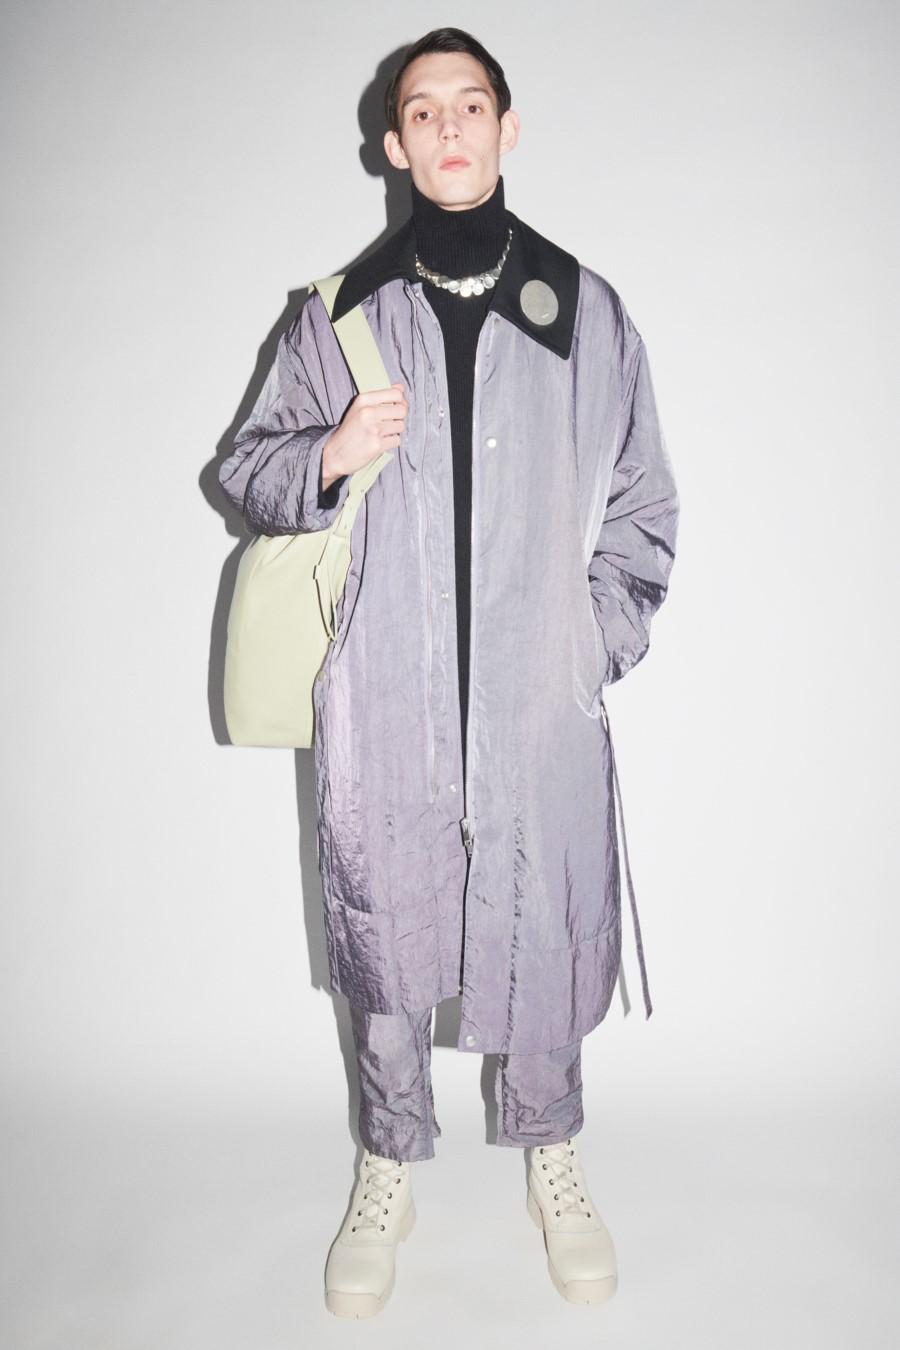 Jil Sander Fall Winter 2021 - Paris Fashion Week Men's